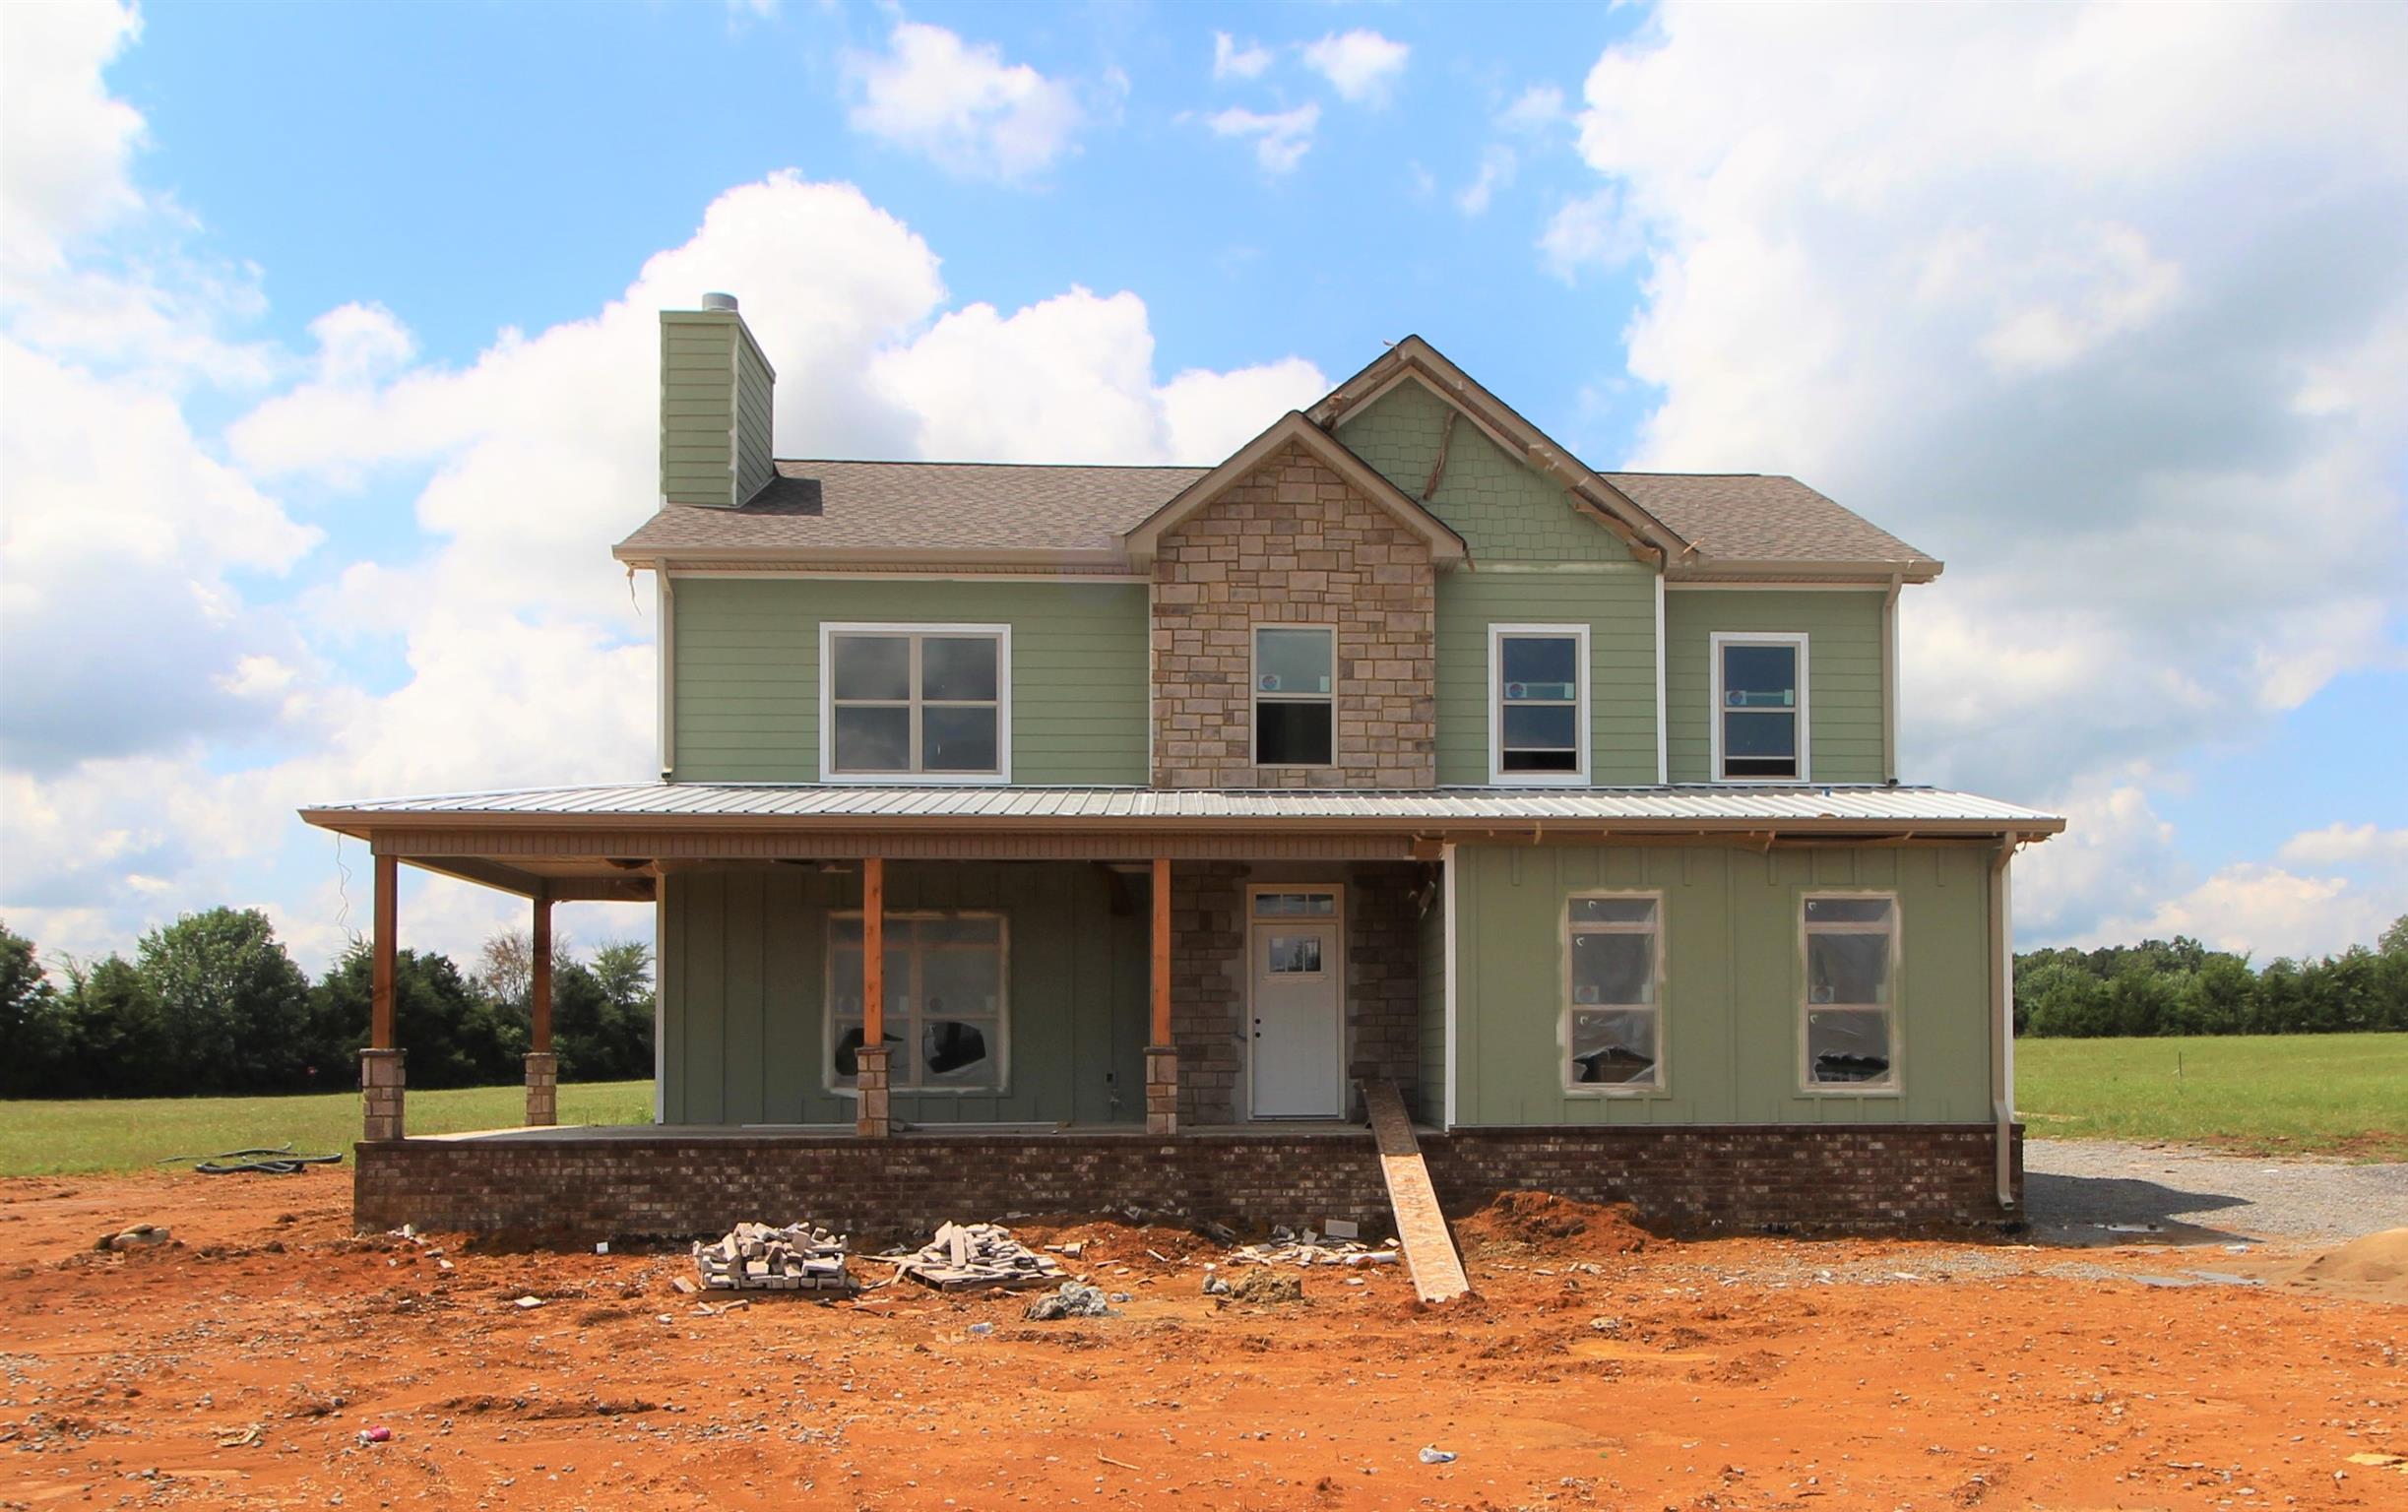 7006 Gum Puckett Rd, Murfreesboro, TN 37127 - Murfreesboro, TN real estate listing